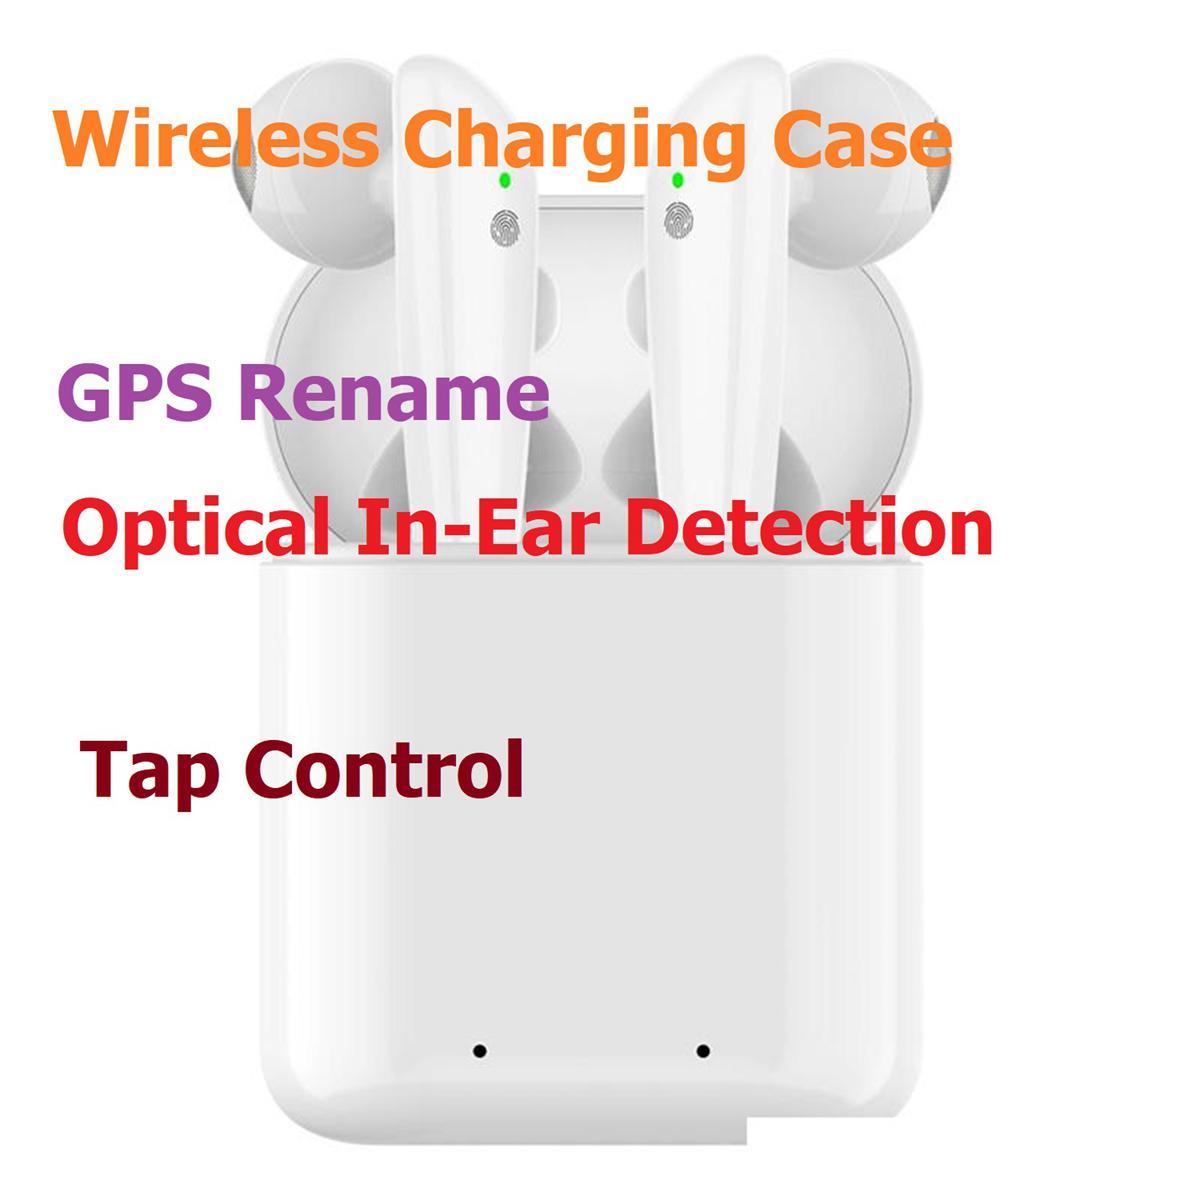 GPS إعادة تسمية AP2 AP3 TWS سماعات بلوتوث سماعات سماعة أذن H1 رقاقة لاسلكية الشحن البصرية الهواء كشف حاضن PK 2 3 برو I12 I9